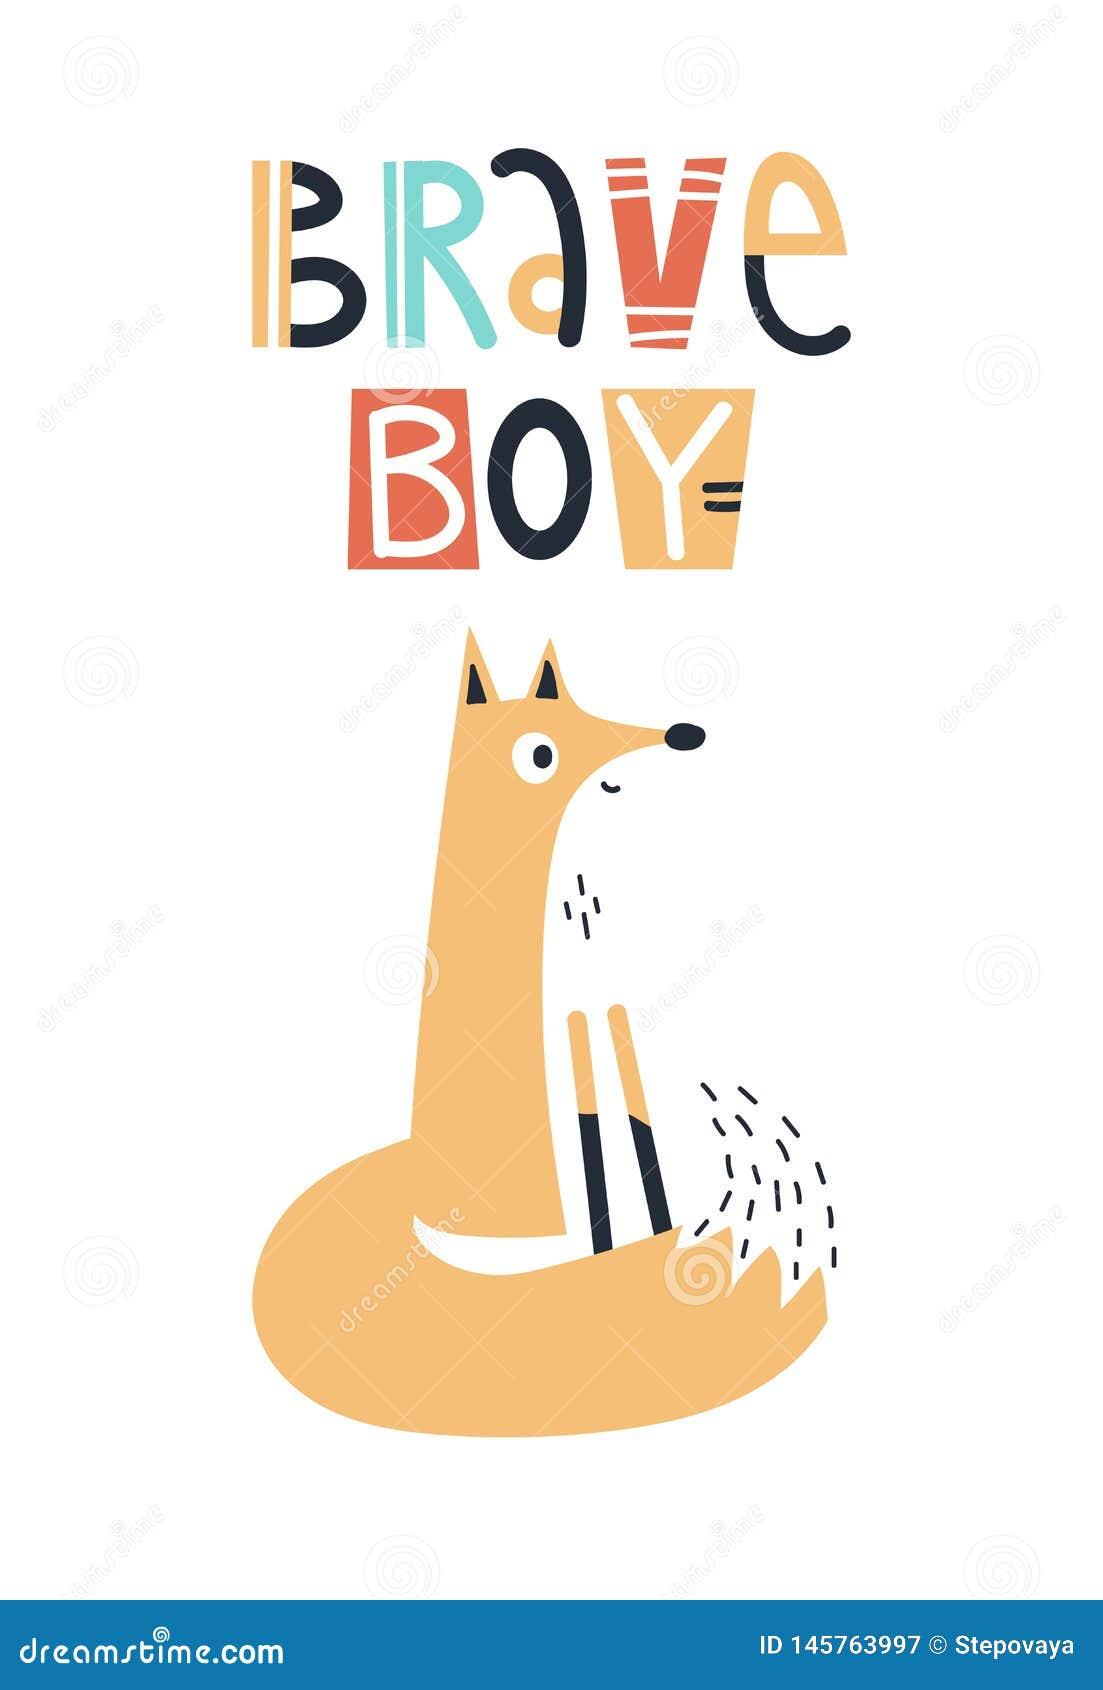 Brave Fox Stock Illustrations 183 Brave Fox Stock Illustrations Vectors Clipart Dreamstime